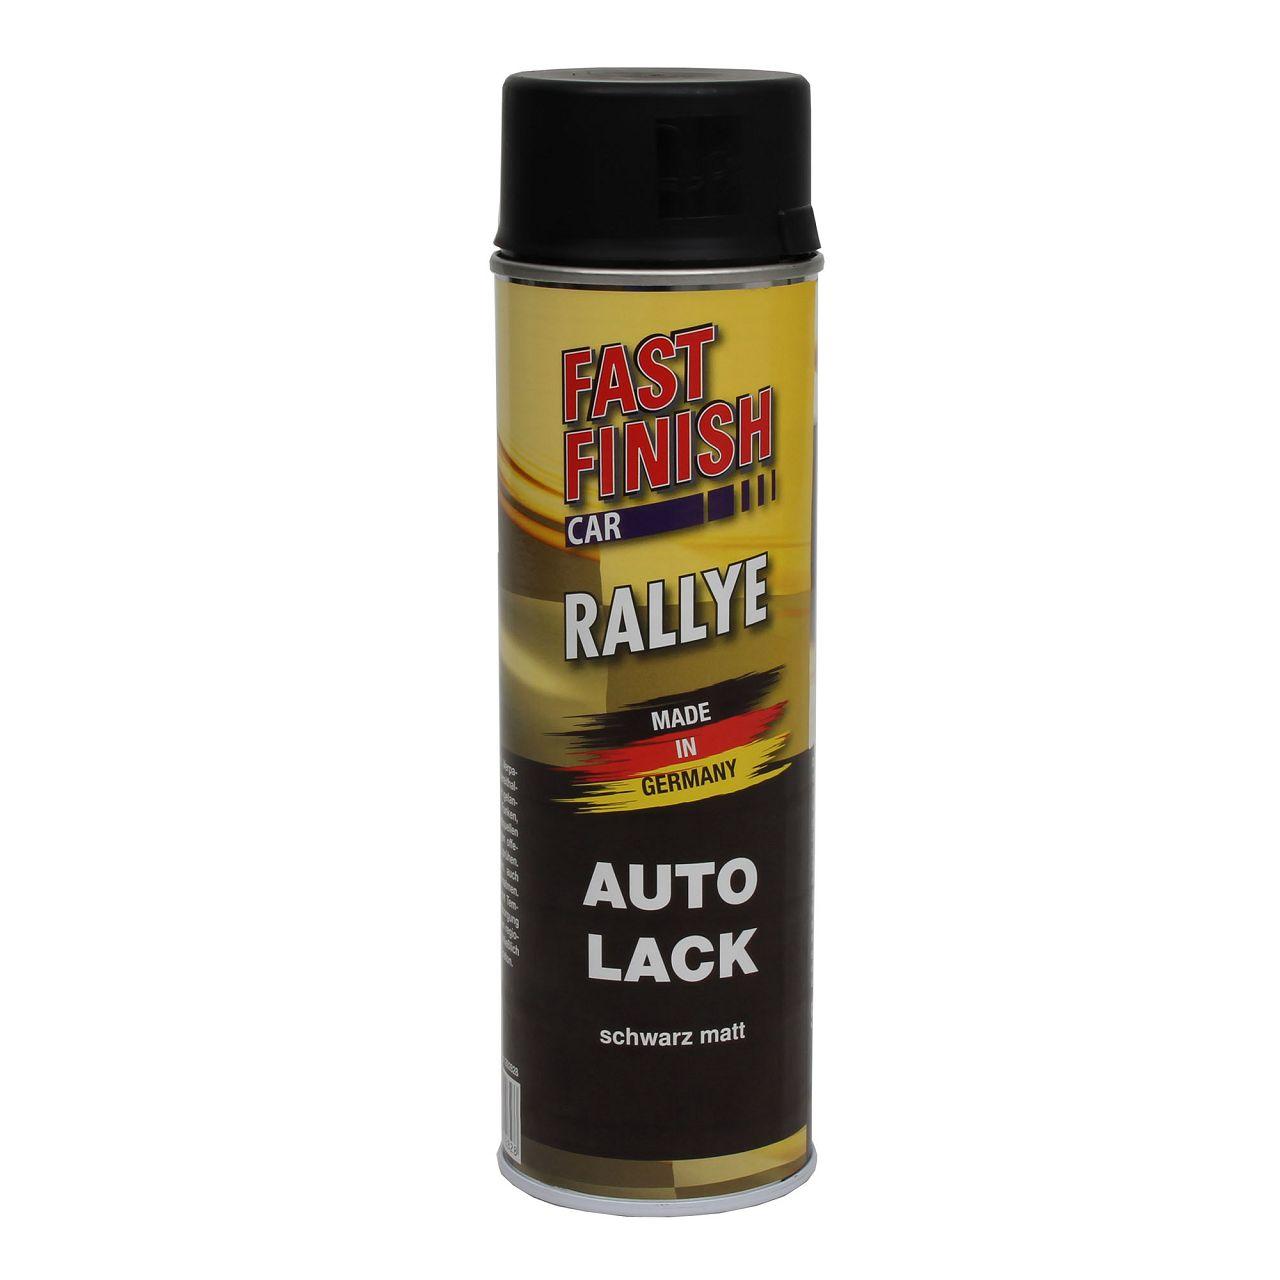 FAST FINISH Rallye Autolack Lackspray Schwarz Matt Spraydose 500ml 292828